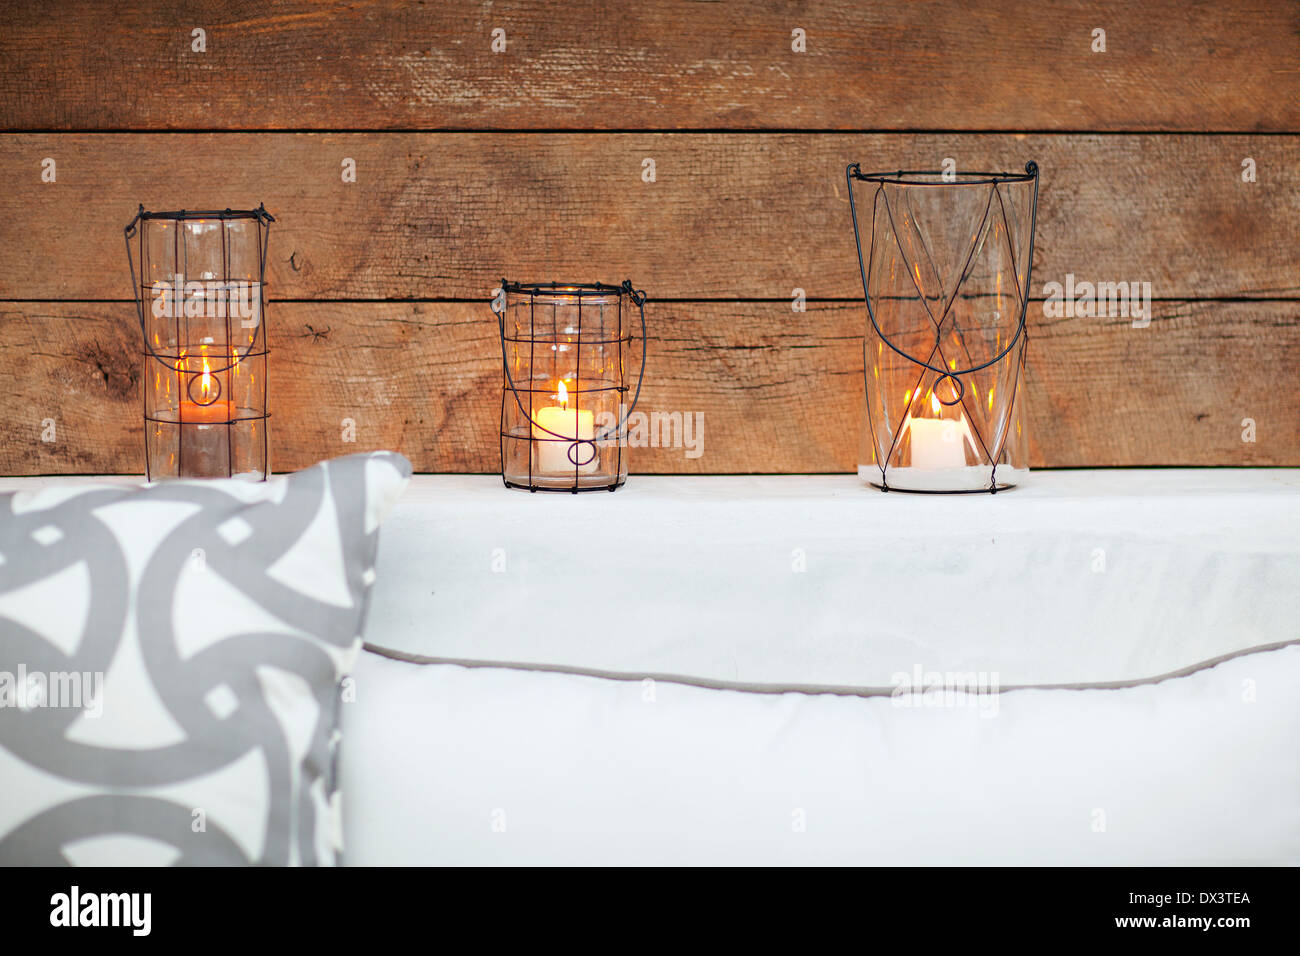 Kerzen beleuchtet in Laternen auf Terrasse Sims Stockbild